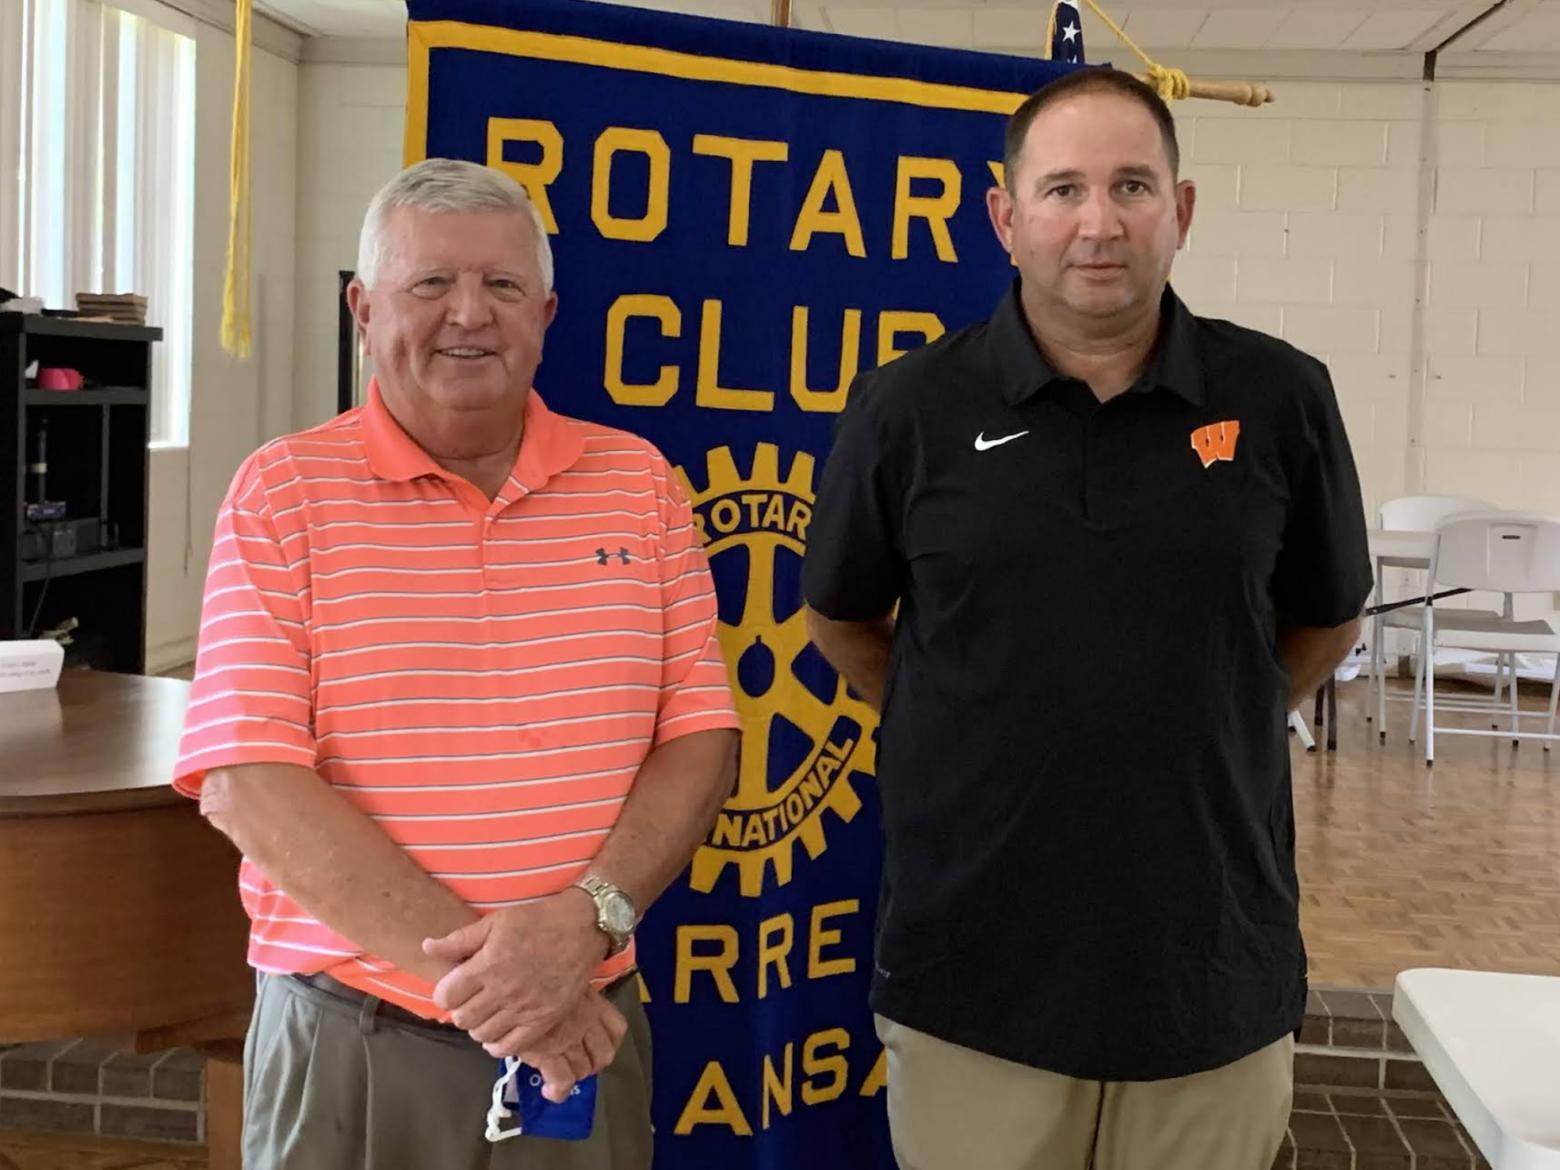 Coach Bo Hembree speaks to Warren Rotary ahead of the 2021 Lumberjack Football season